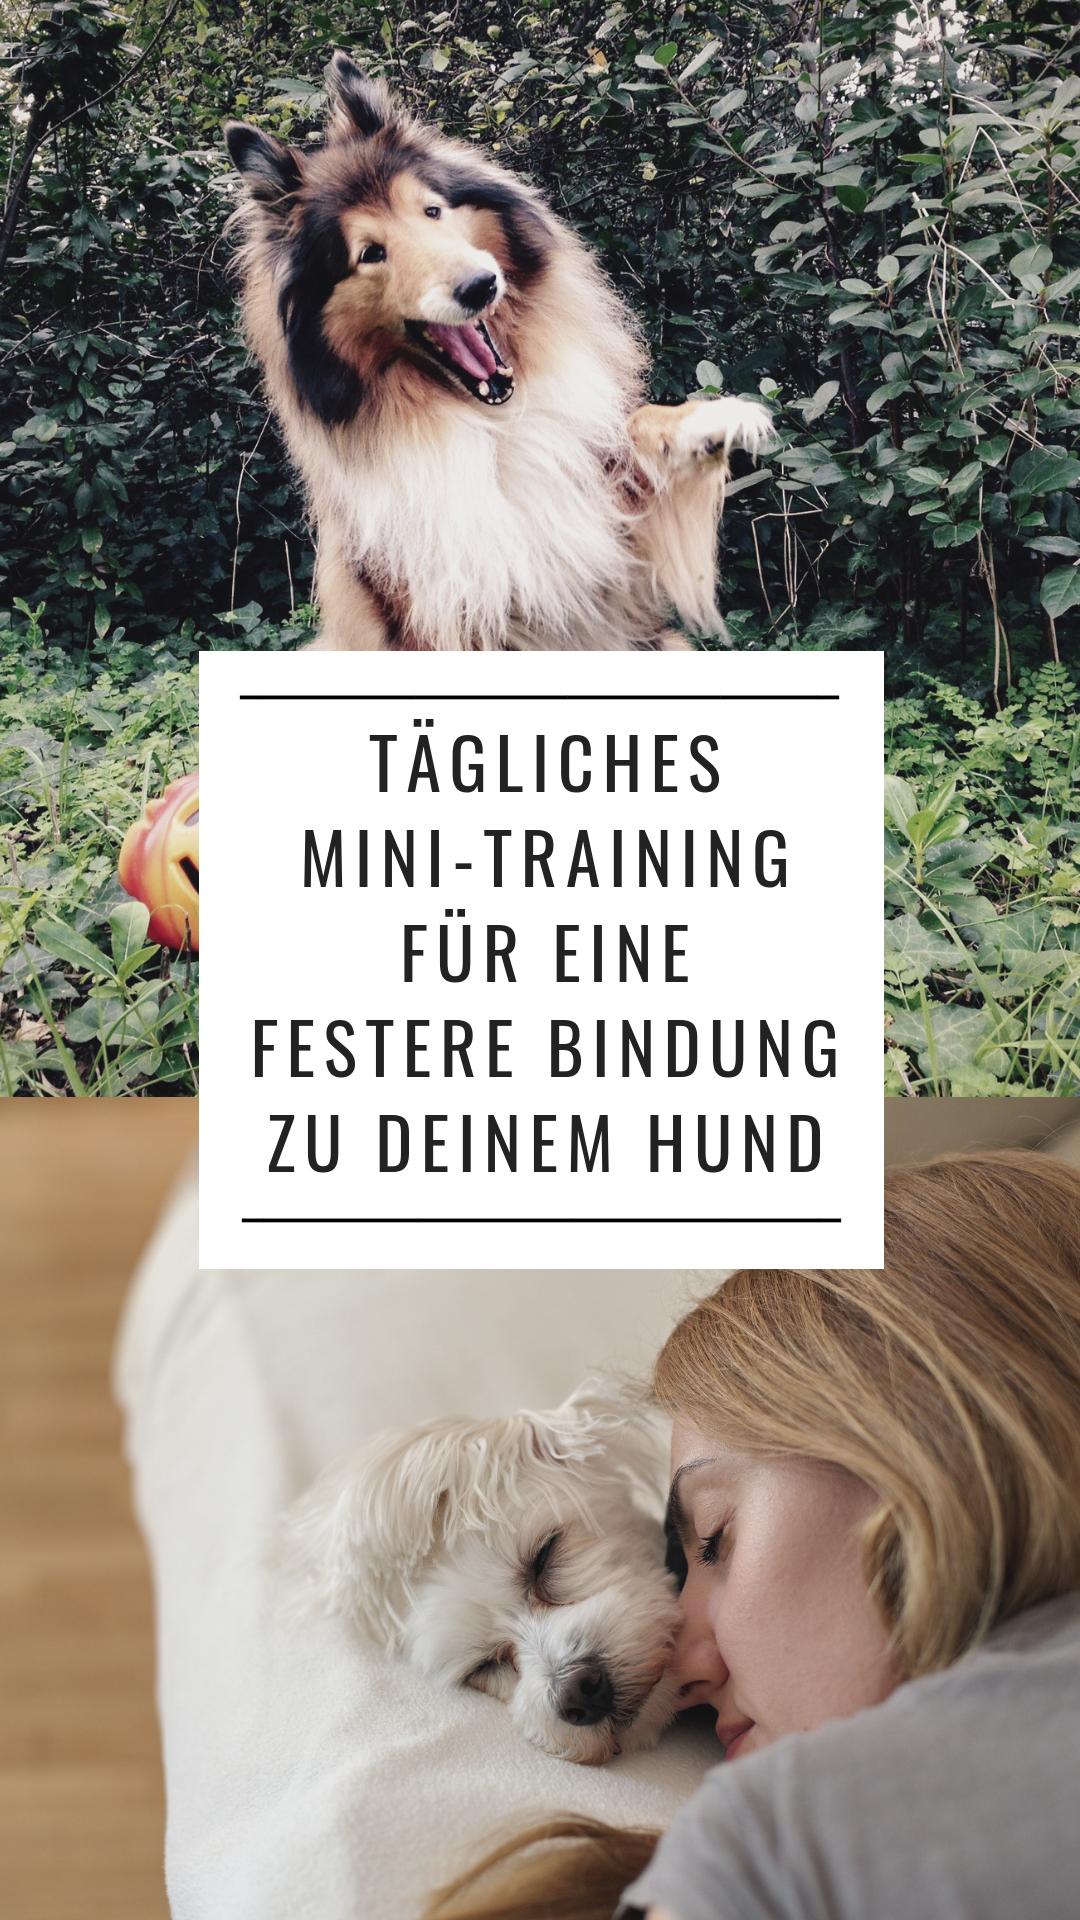 #Hund Bindung Hundetraining Hunde Training Tipps Ideen Bilder dog Hundeliebe